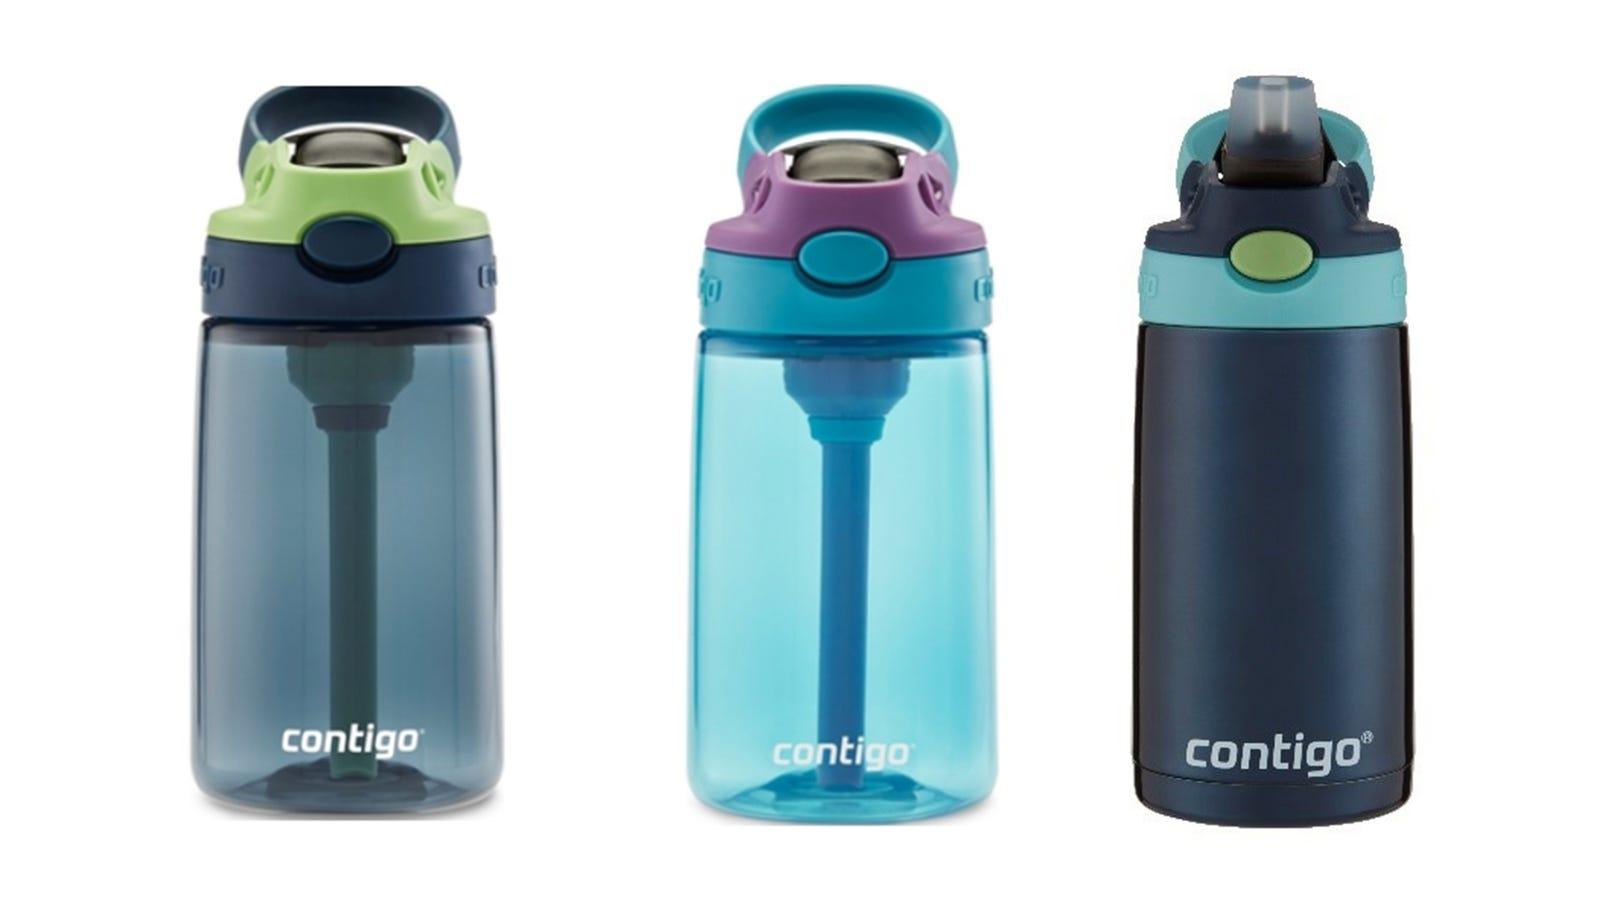 Your Kid's Contigo Water Bottle May Be a Choking Hazard